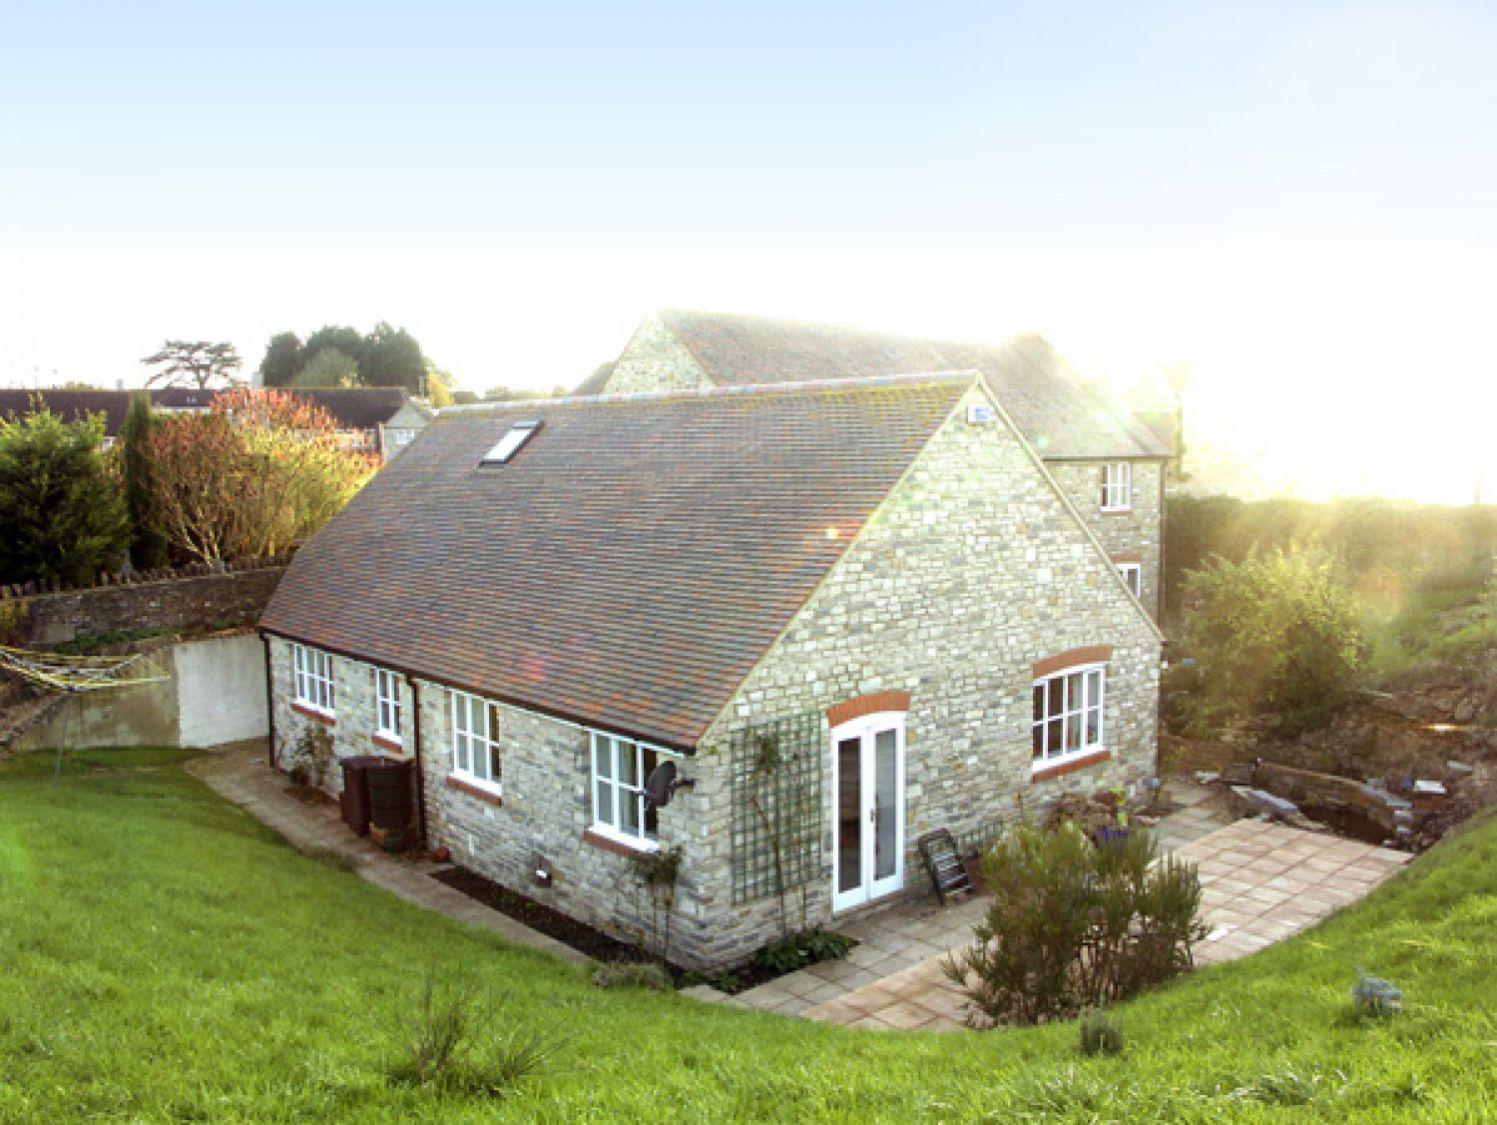 Clune Cottage - Somerset & Wiltshire - 1940 - photo 1